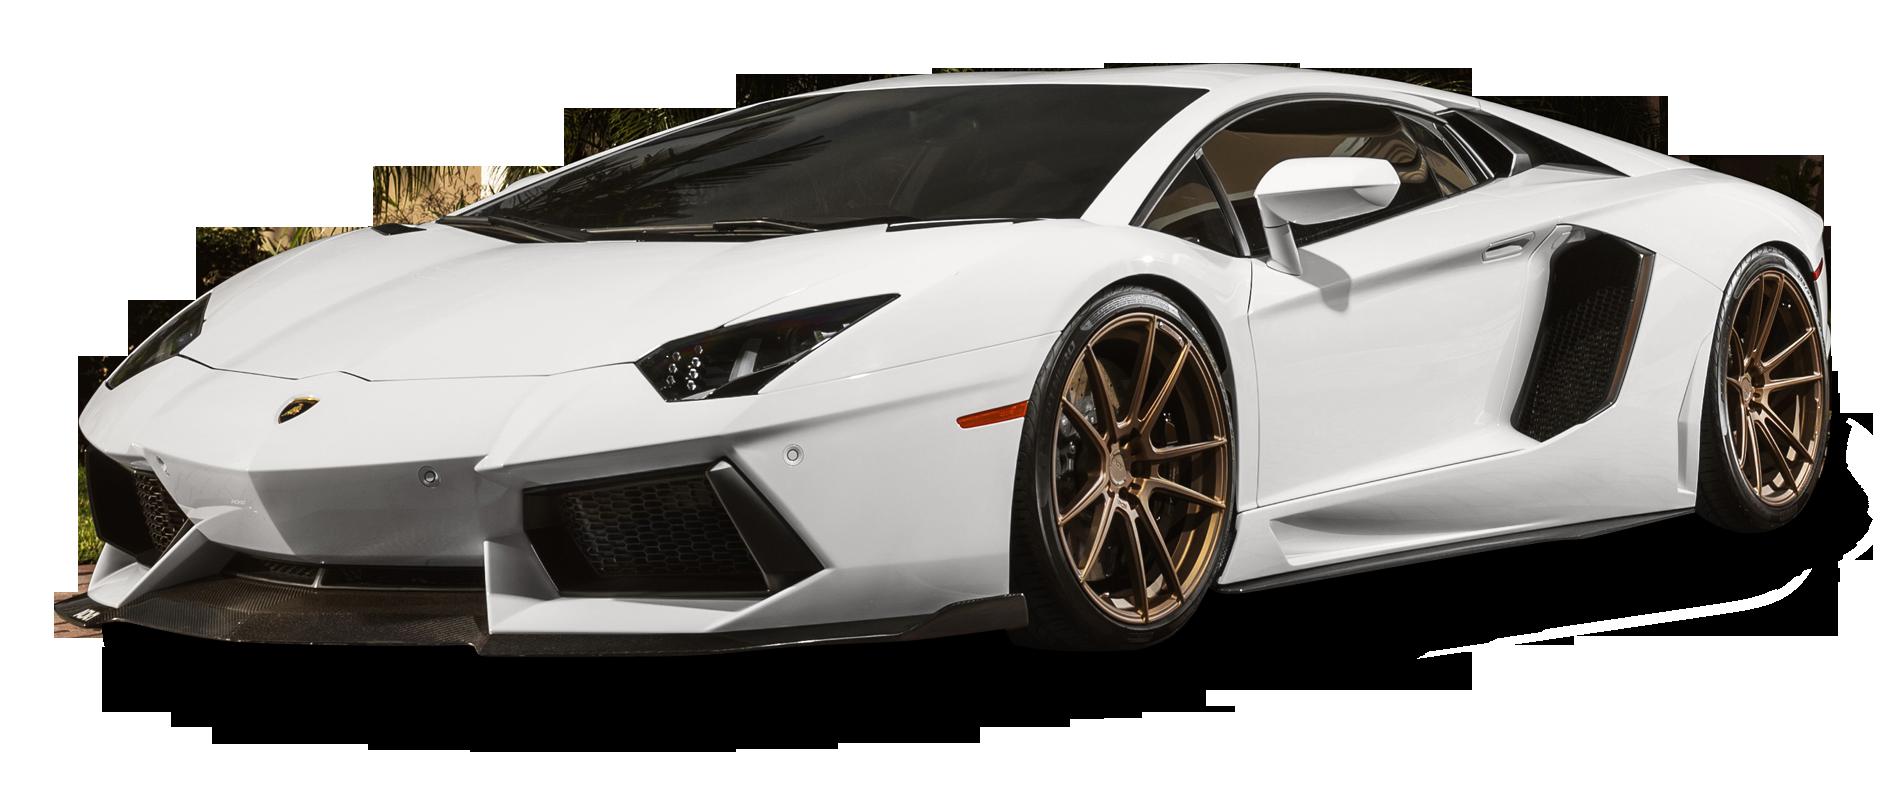 White Lamborghini Aventador Car PNG Image - PurePNG | Free ...